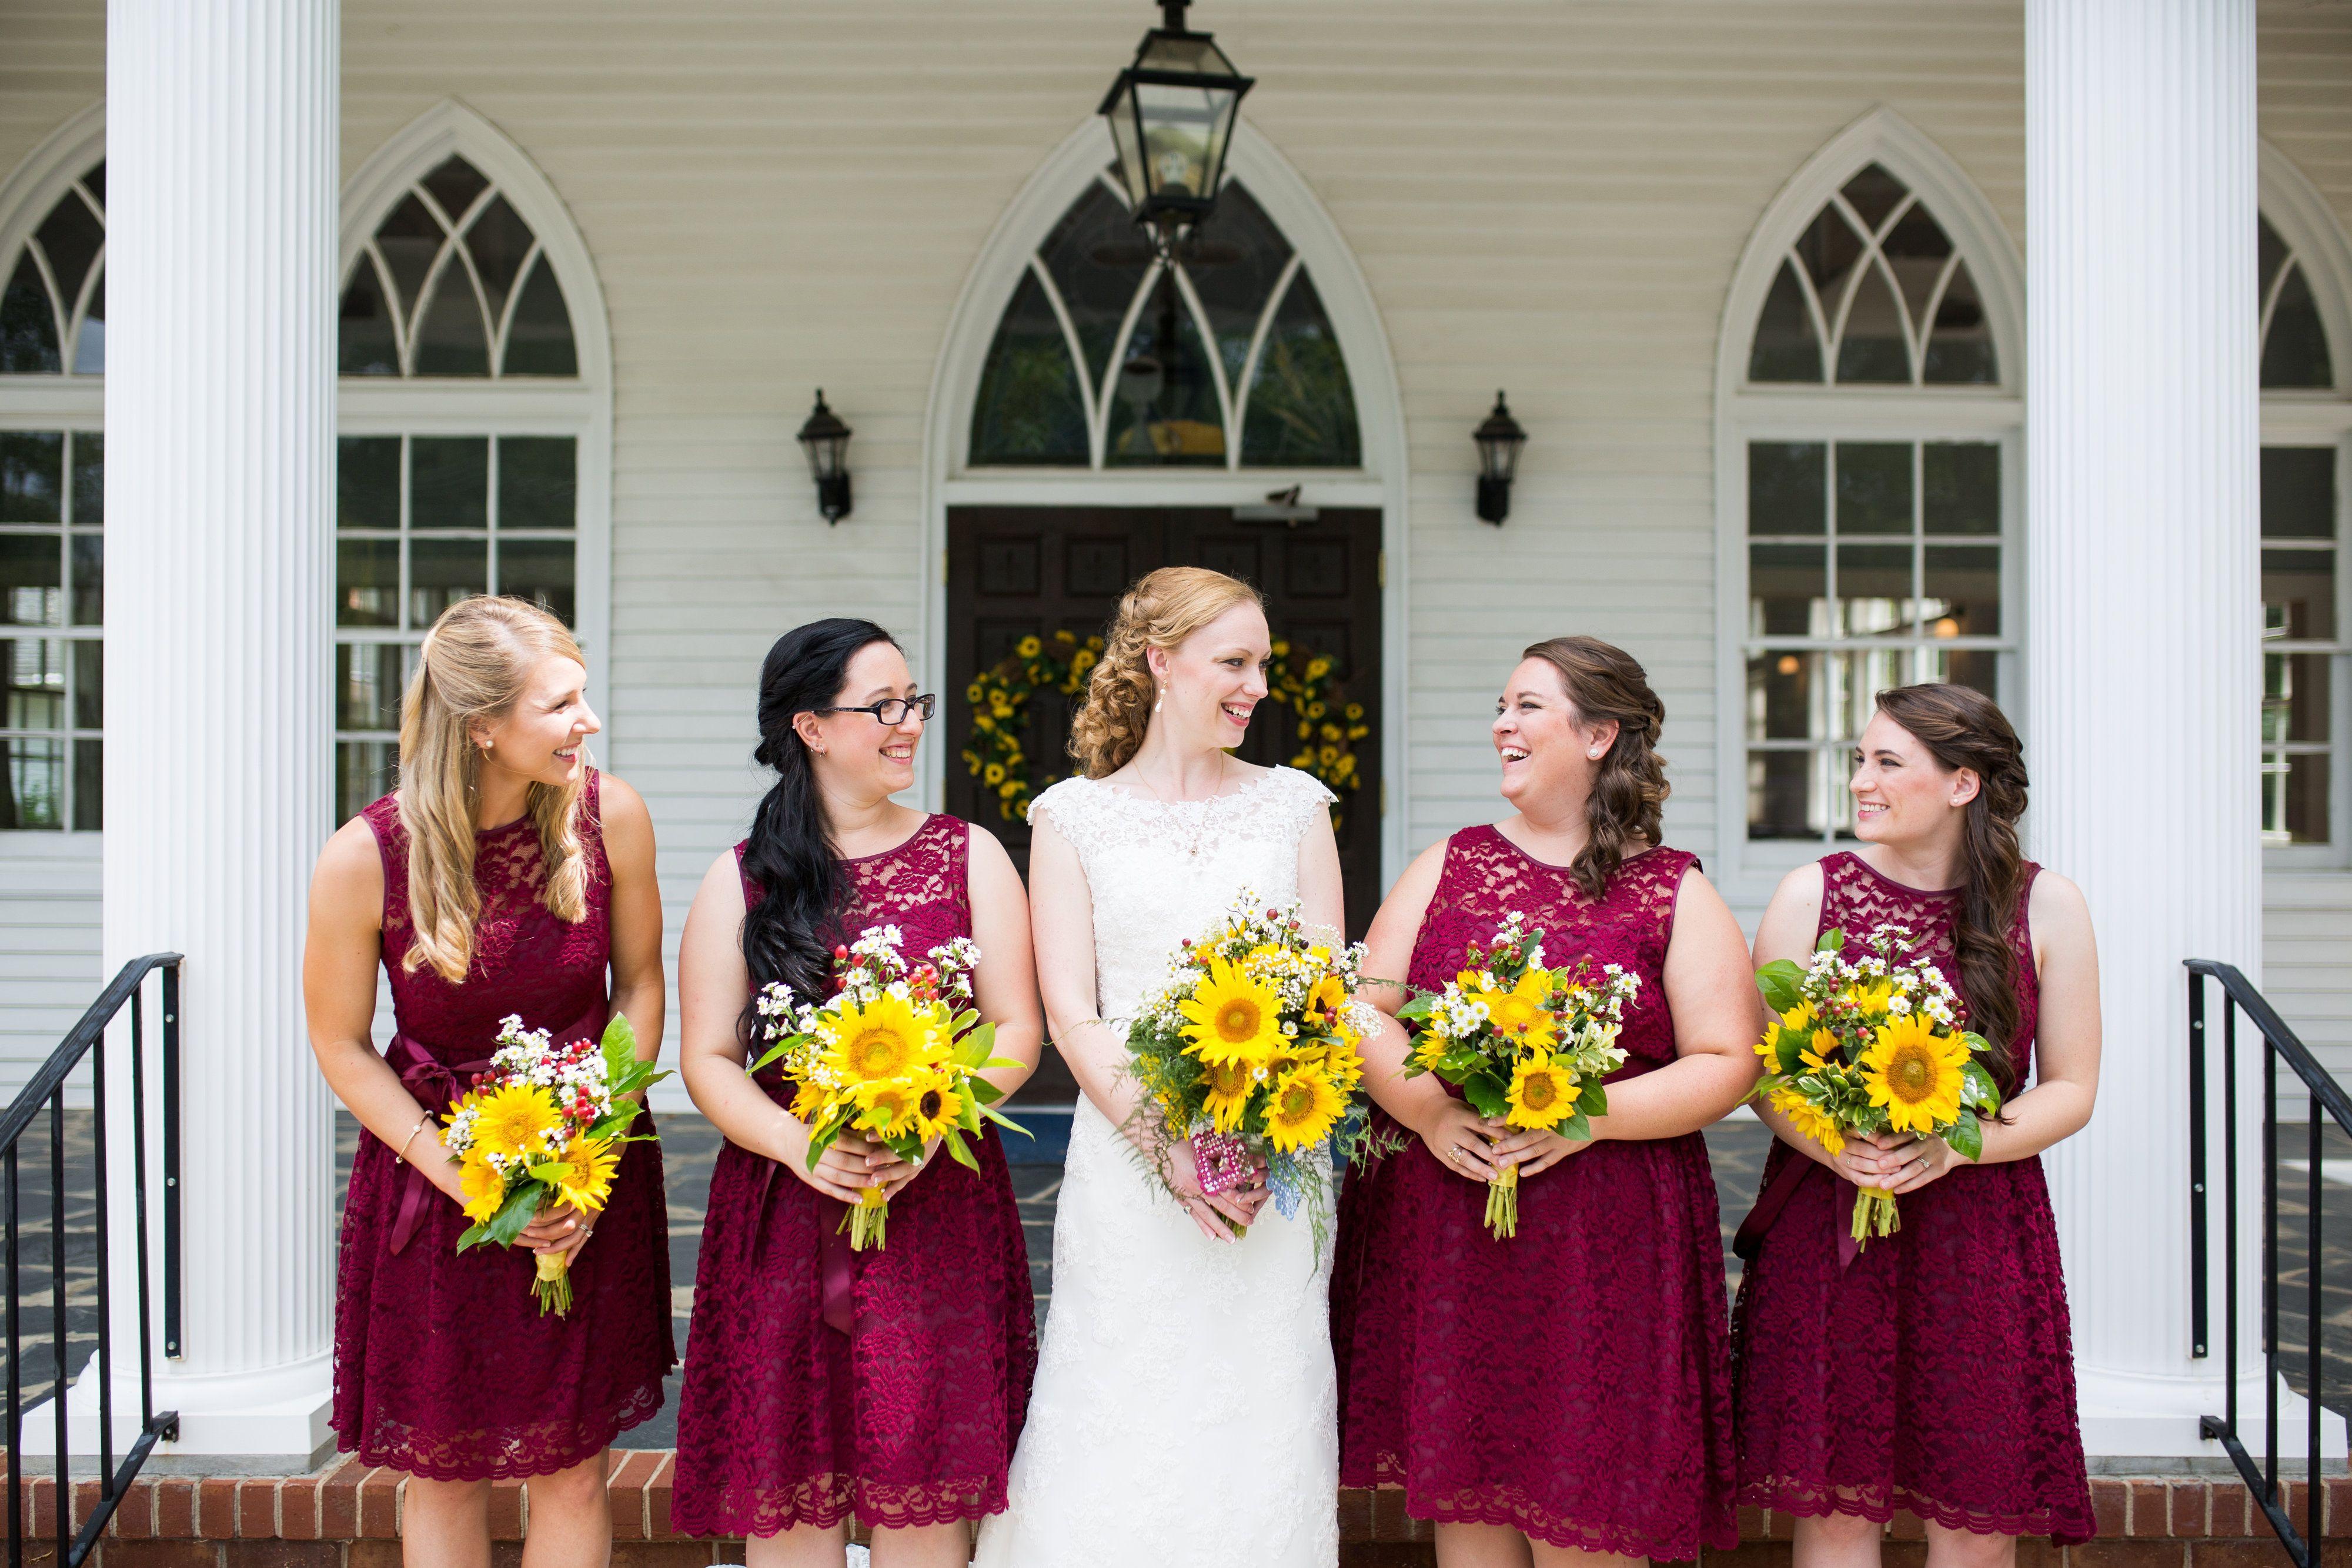 Sunflower wedding bridesmaid dresses choice image braidsmaid burgundy lace bridesmaid dresses with sunflower bouquets autumn burgundy lace bridesmaid dresses with sunflower bouquets autumn ombrellifo Images